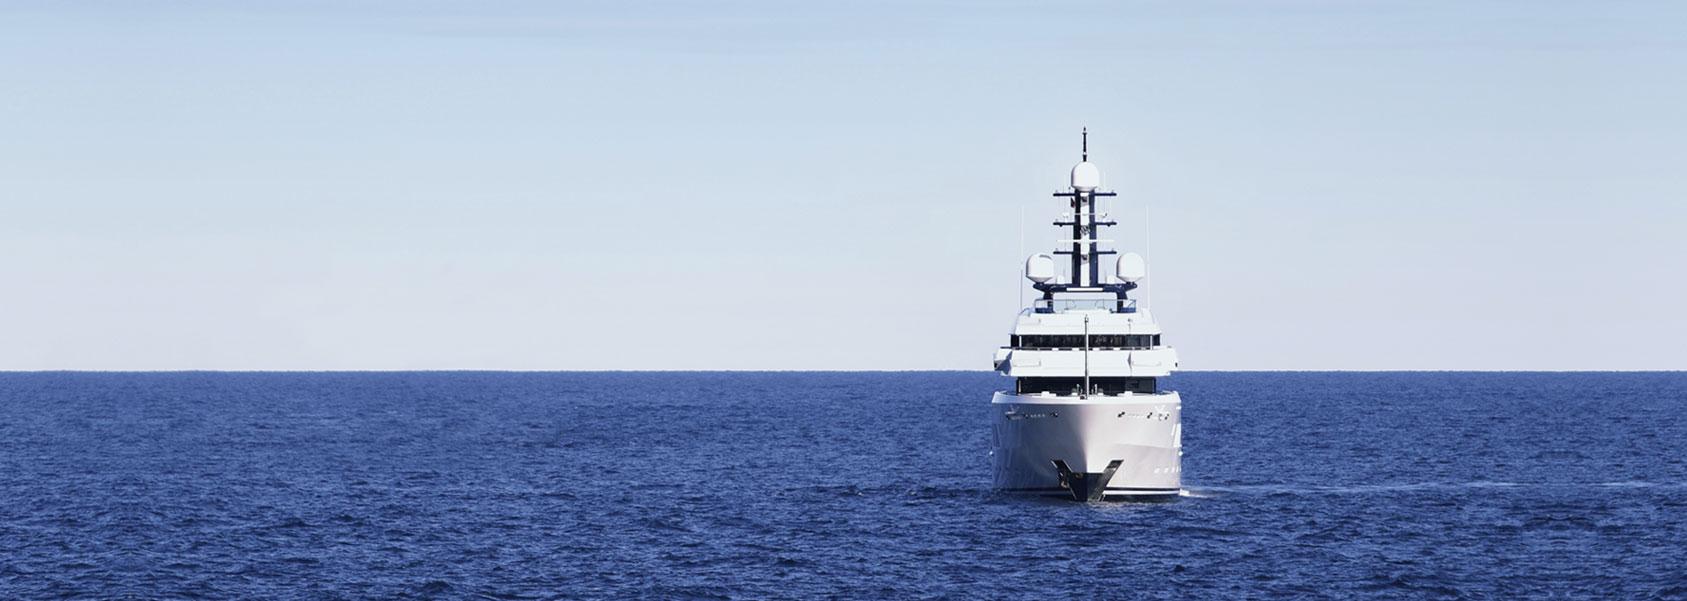 igs-nettoyage-entretien-bateau-yatch-nice-marseille